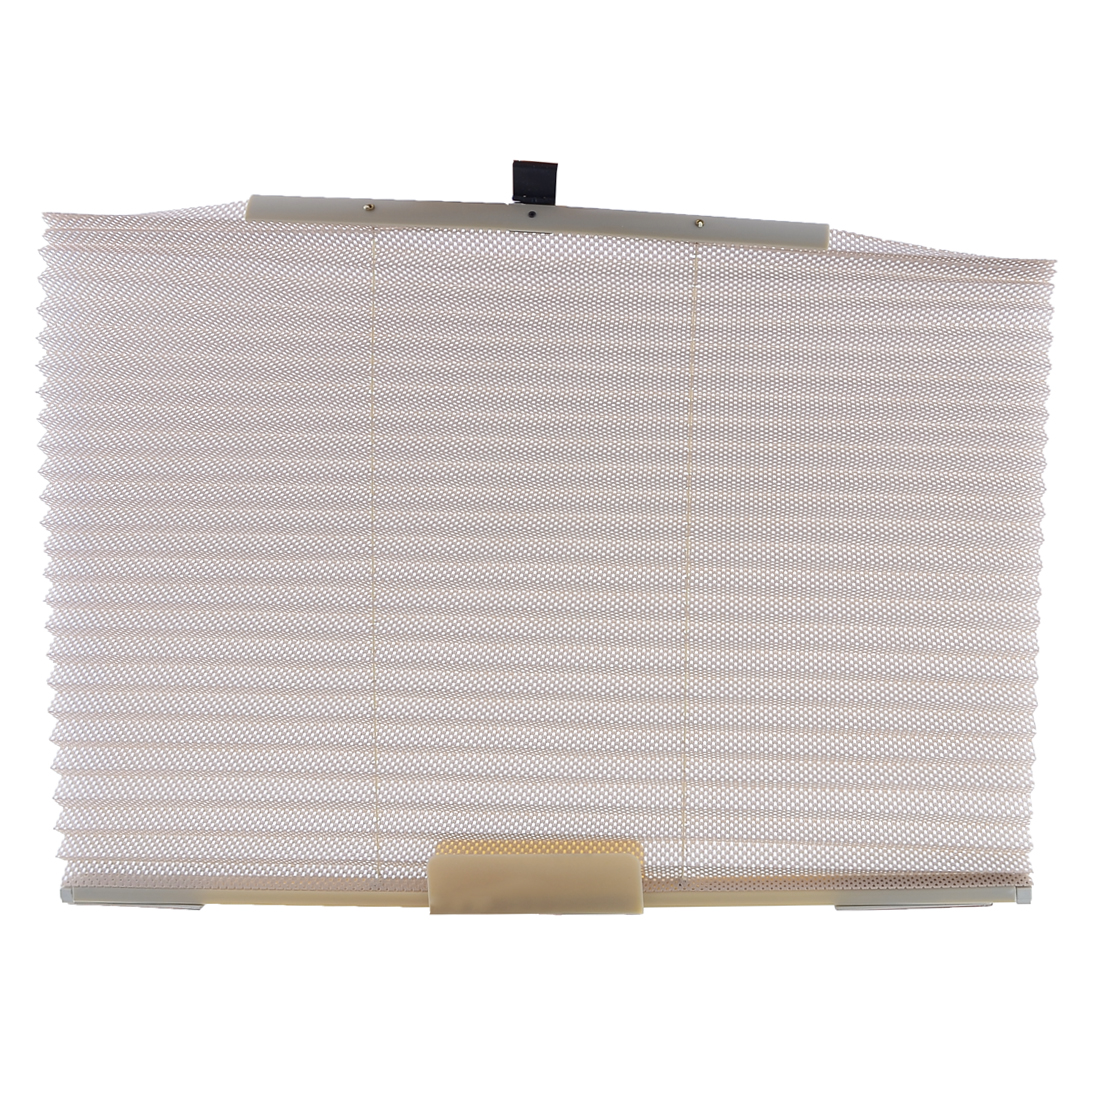 Auto Car Khaki Side Window Folding Retractable Sun Shade 600mm x 450mm